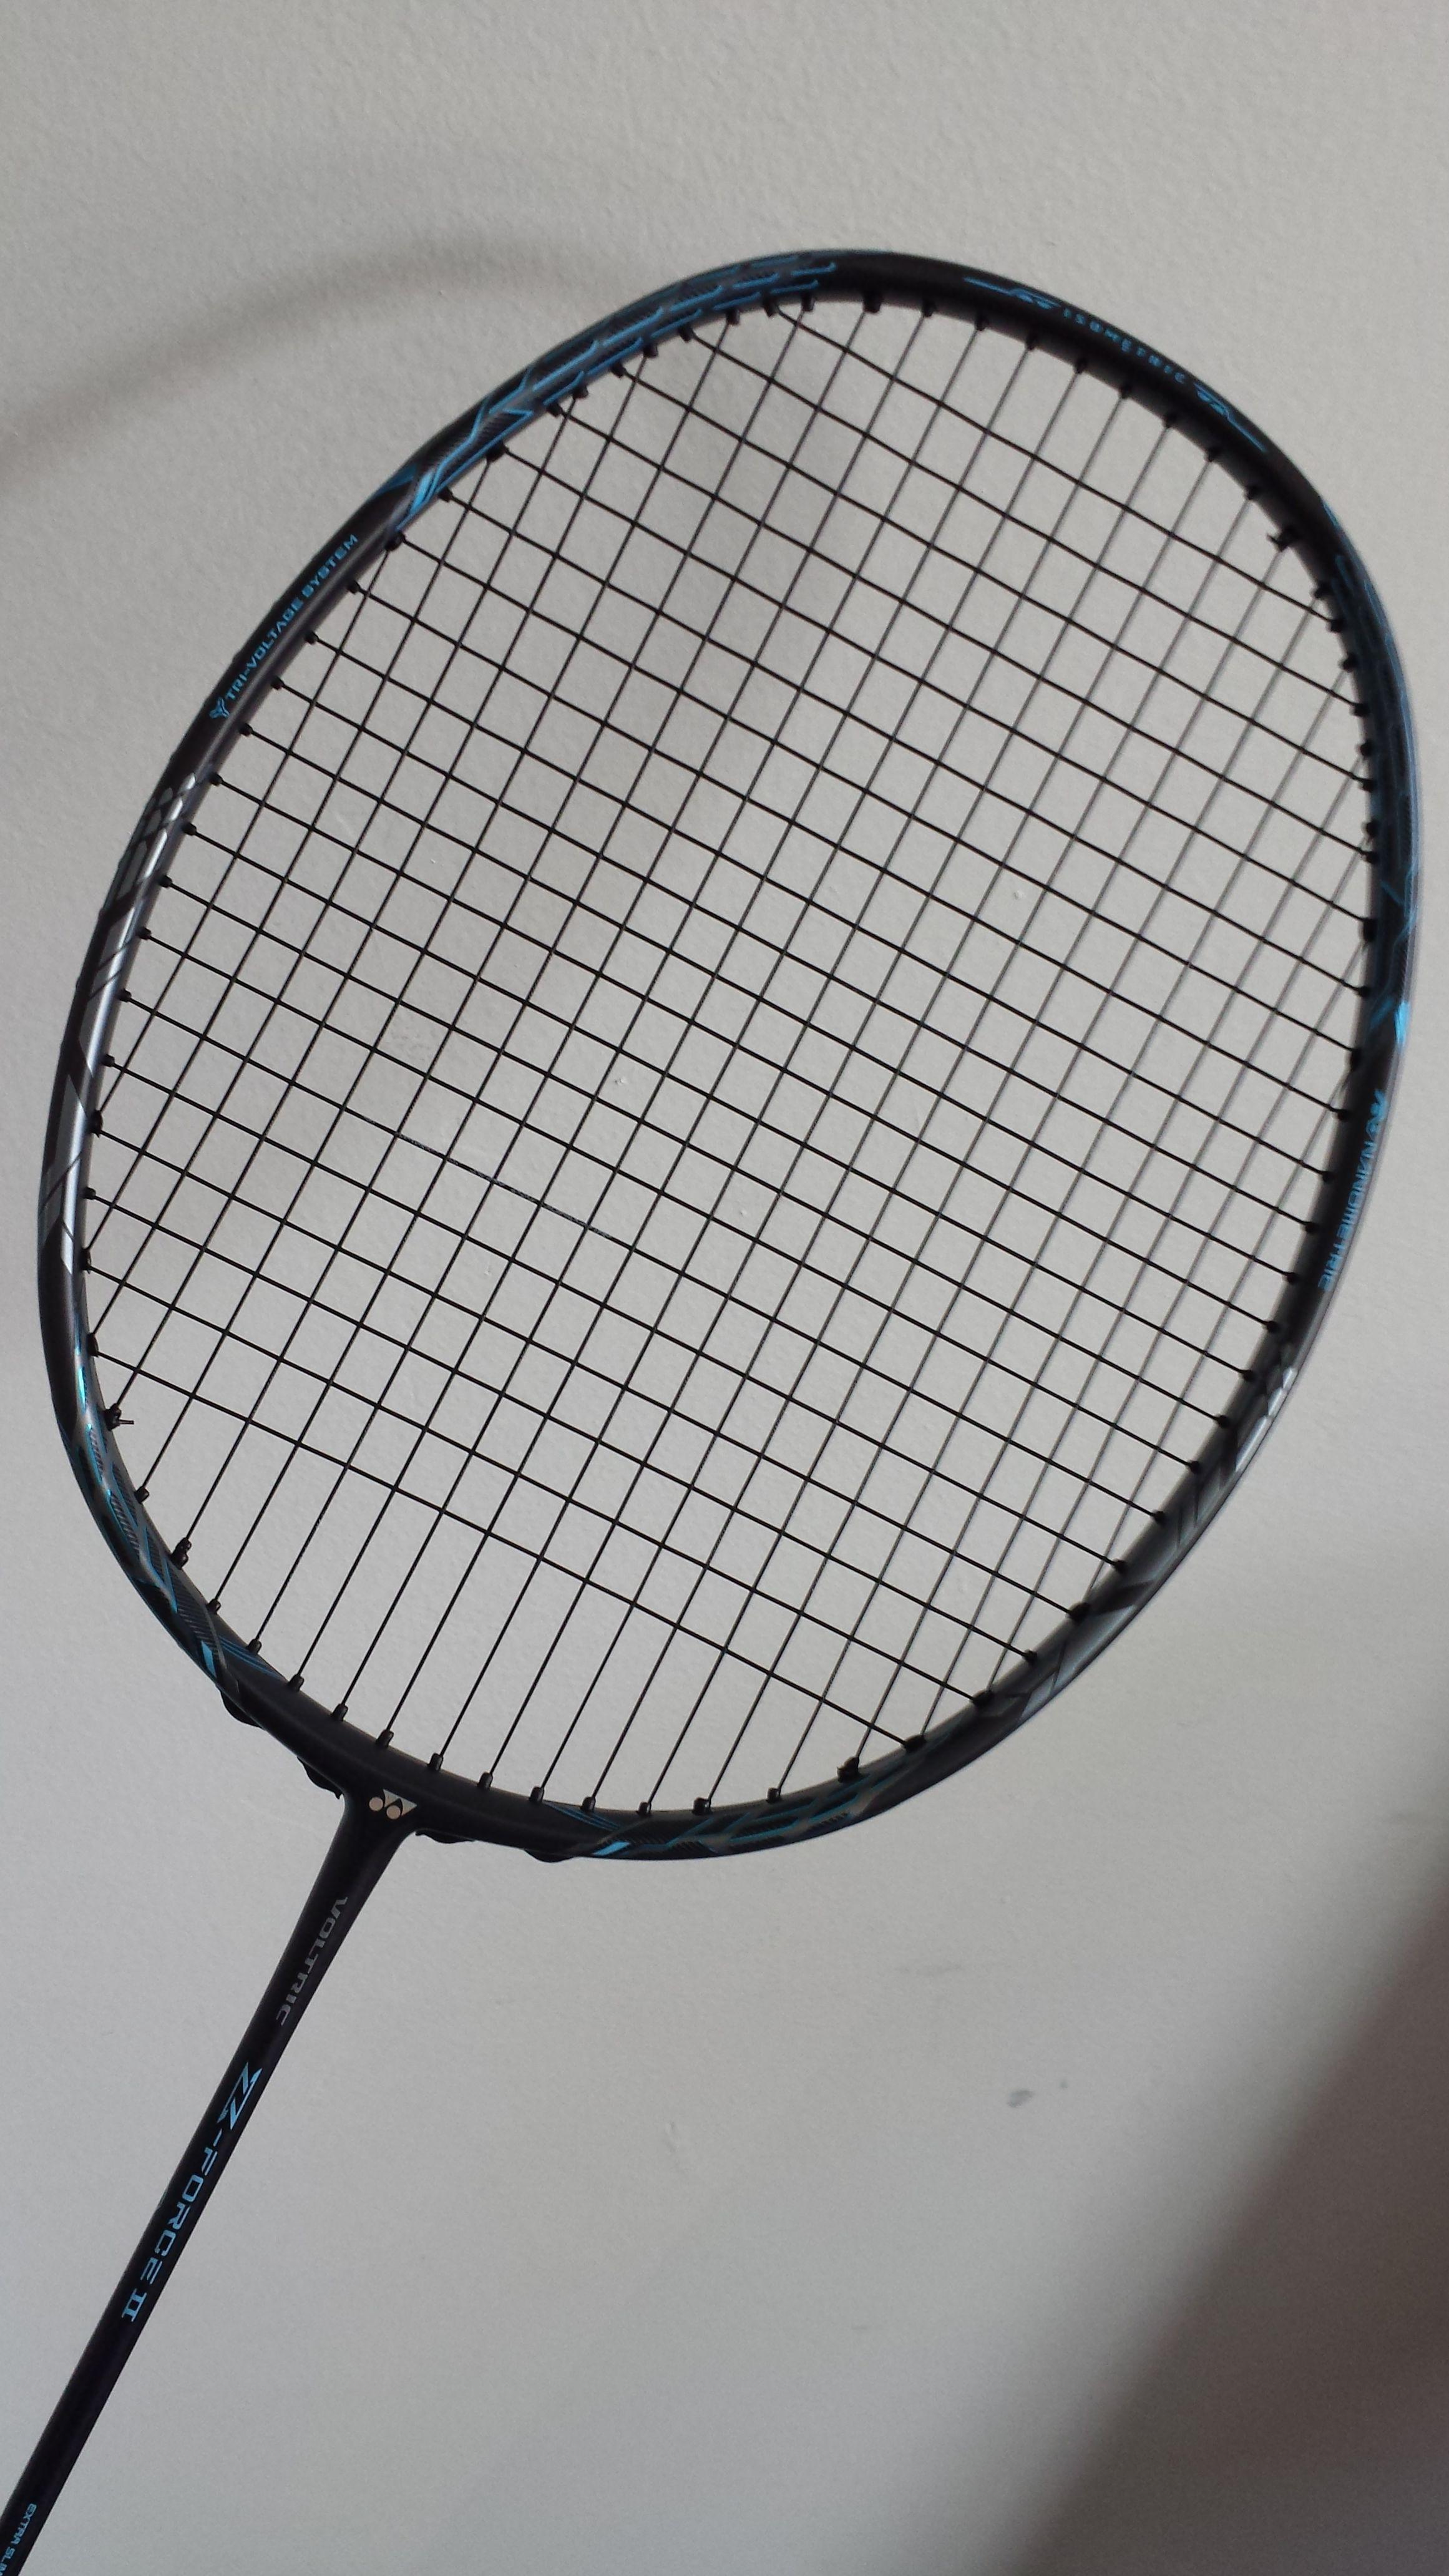 racquetball court diagram chevy tahoe interior yonex z force ii 43 adidas adipower pro black badminton